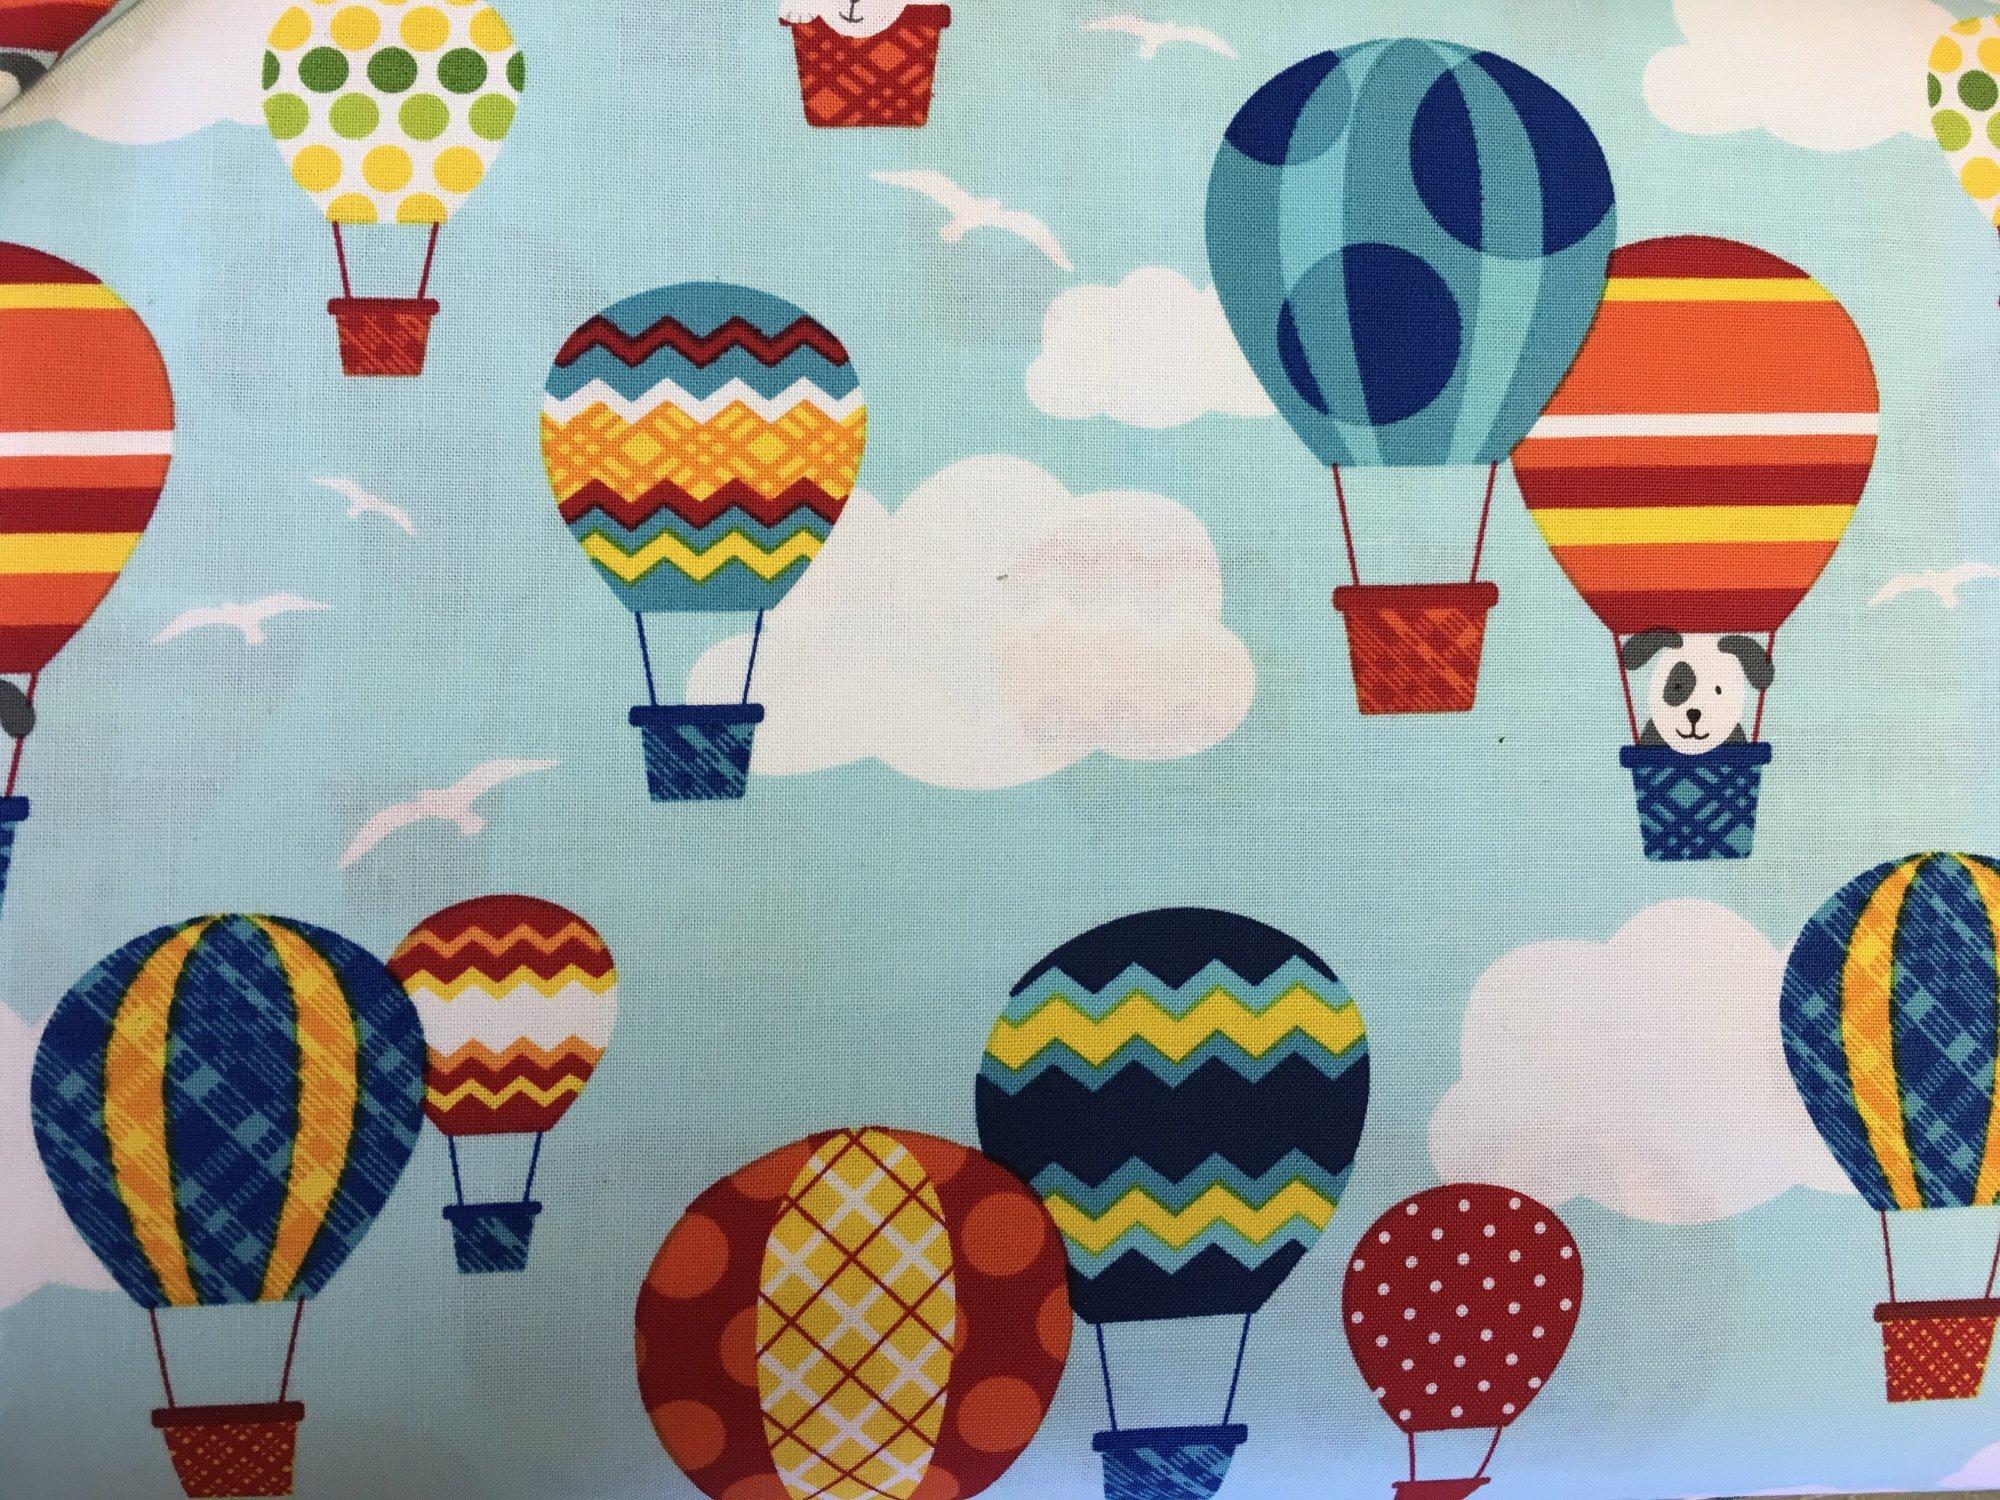 OFF WE GO AIR BALLOONS 412811 Studioe